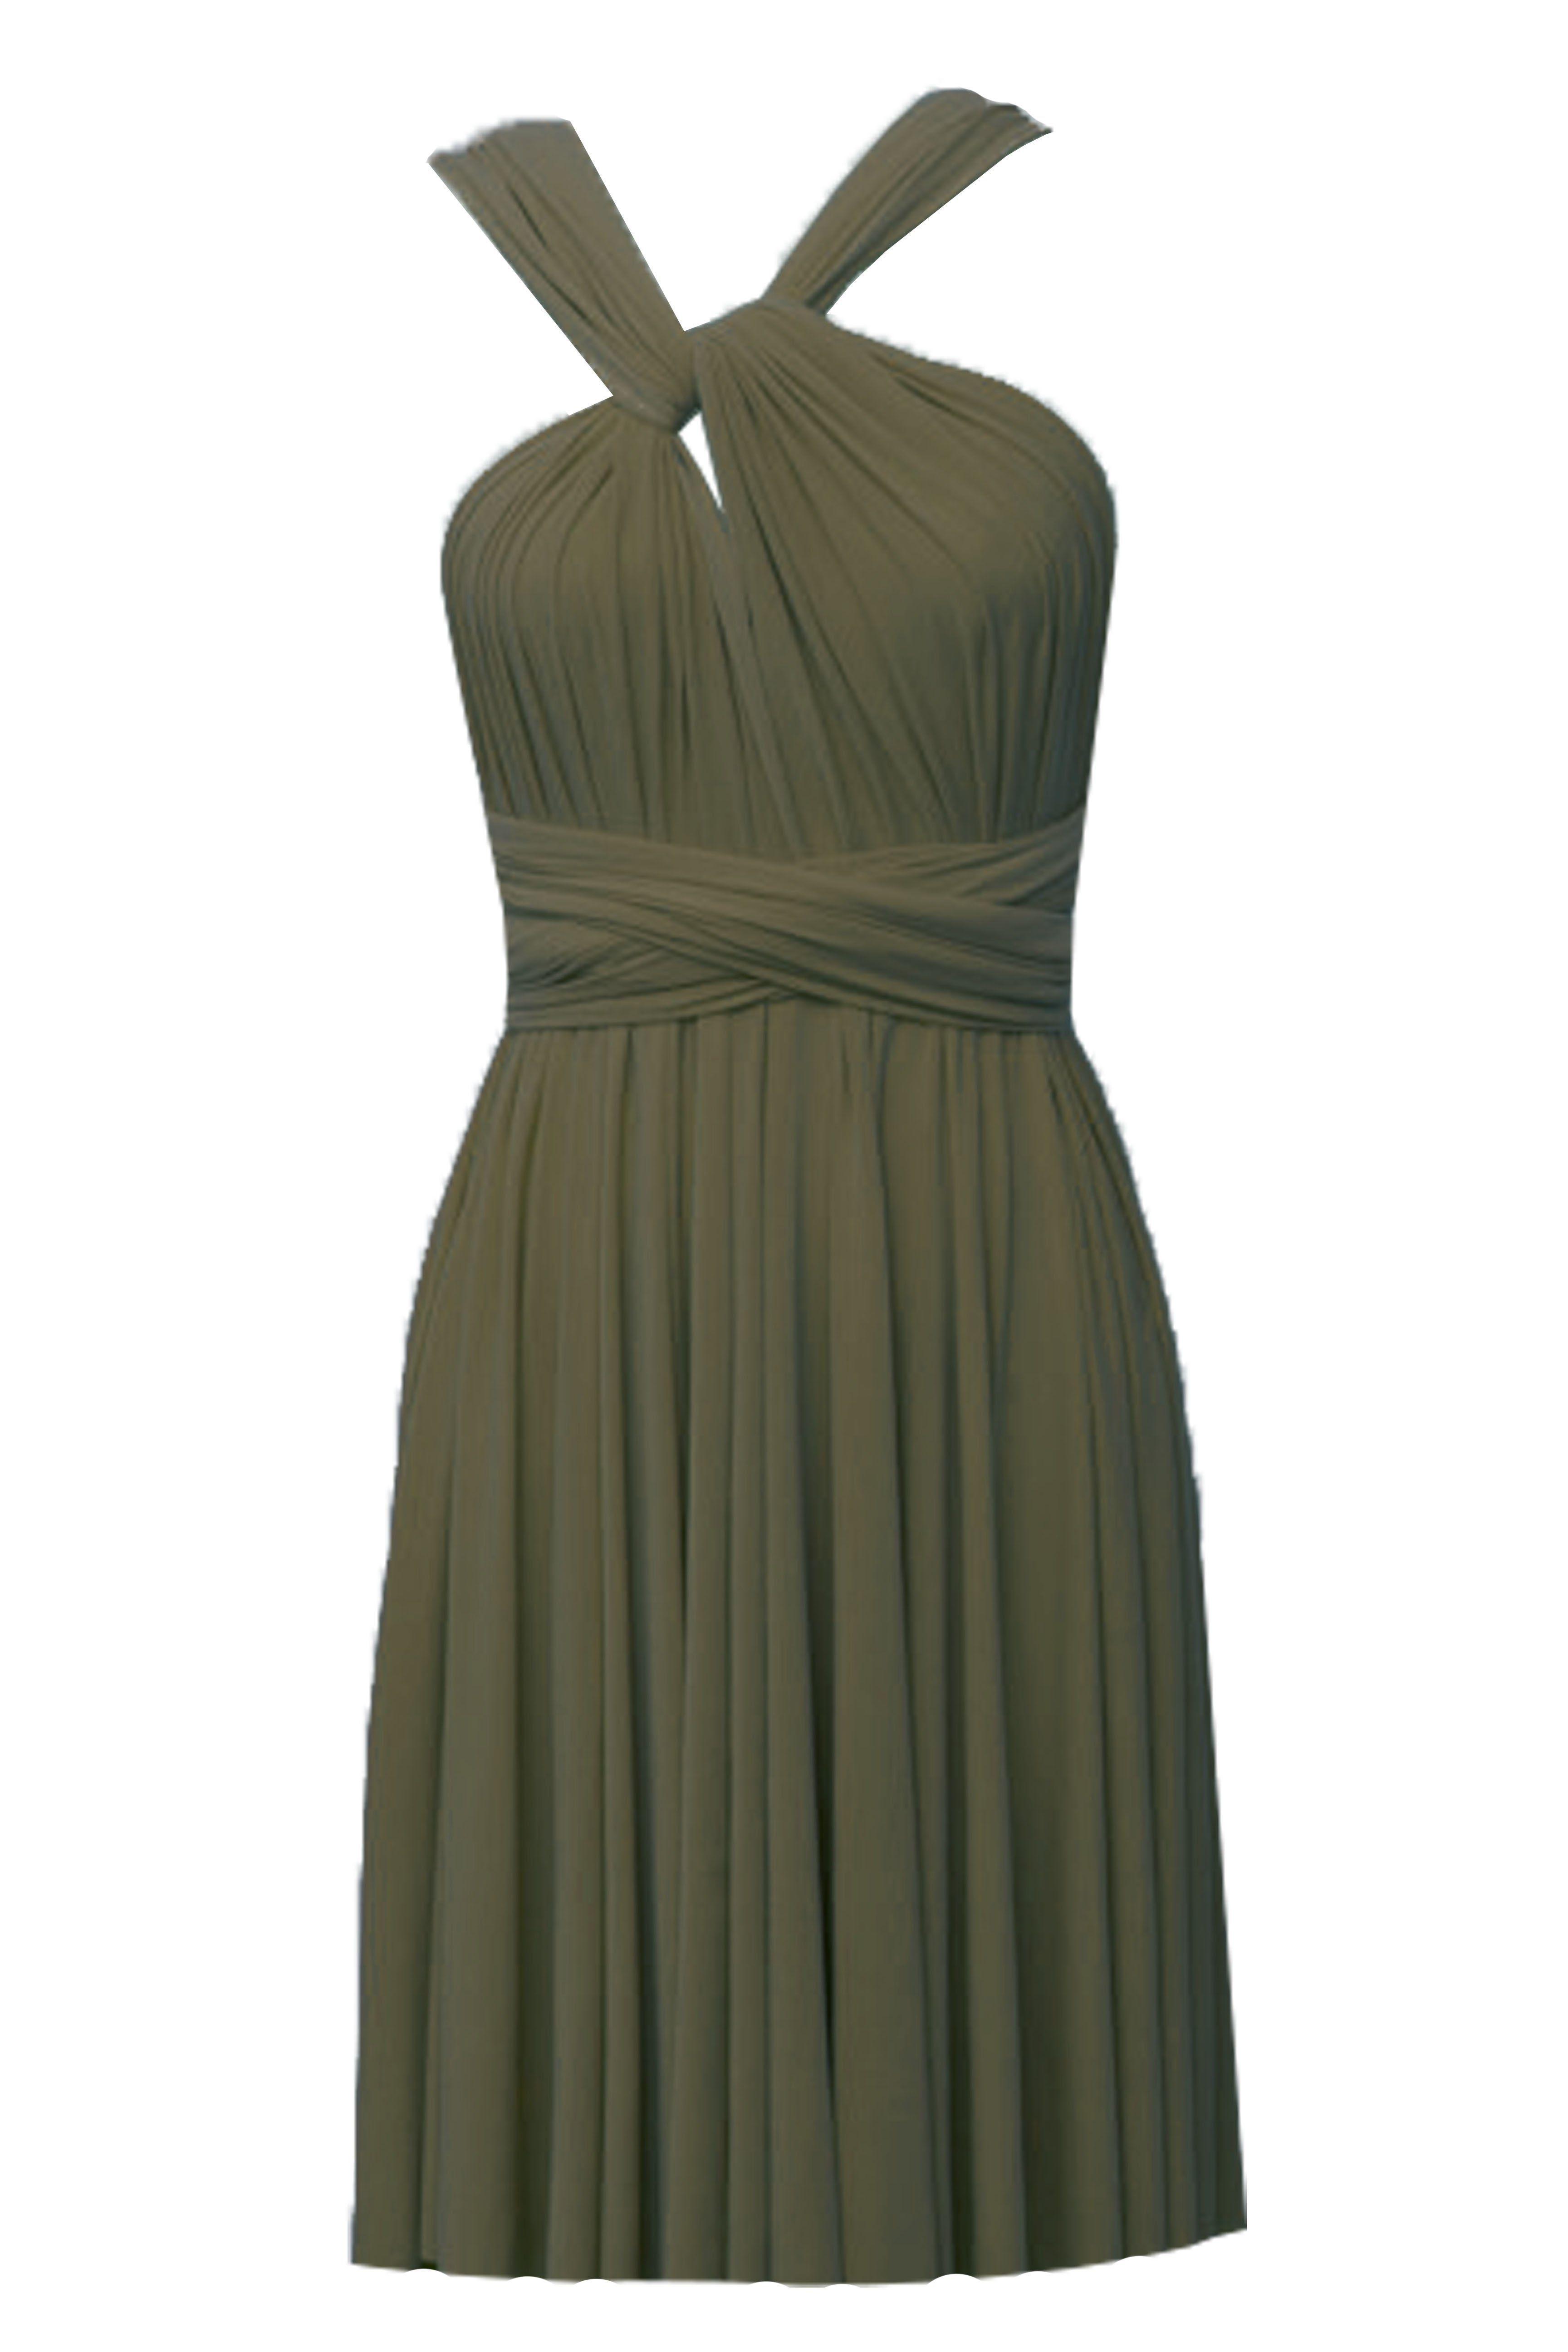 Infinity wrap bridesmaids dress olive green convertible short dress